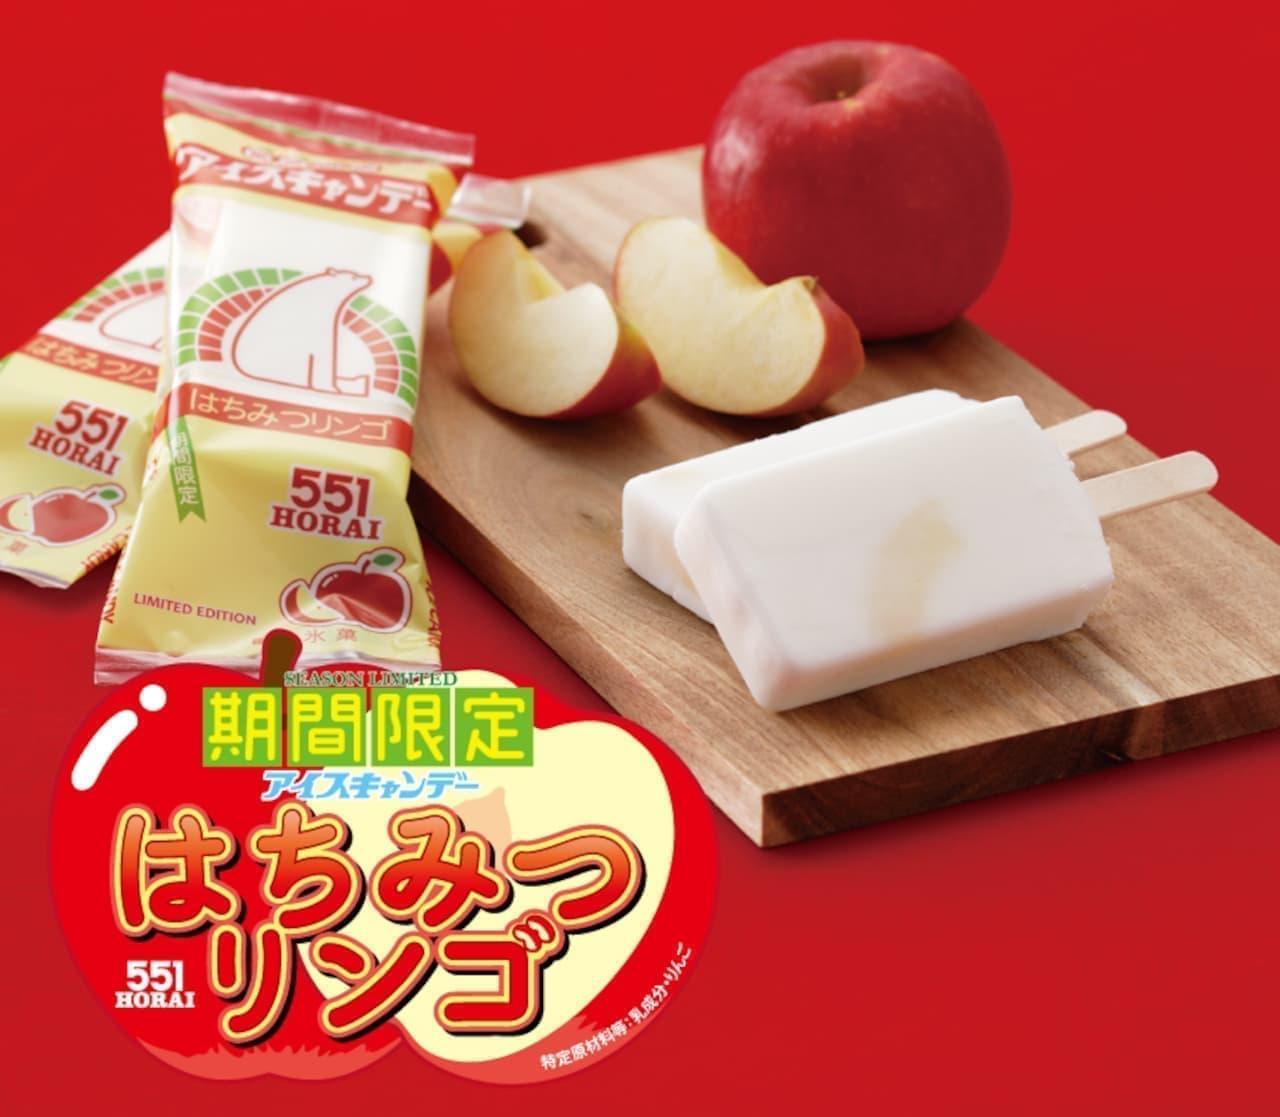 551HORAI アイスキャンデー「はちみつリンゴ」